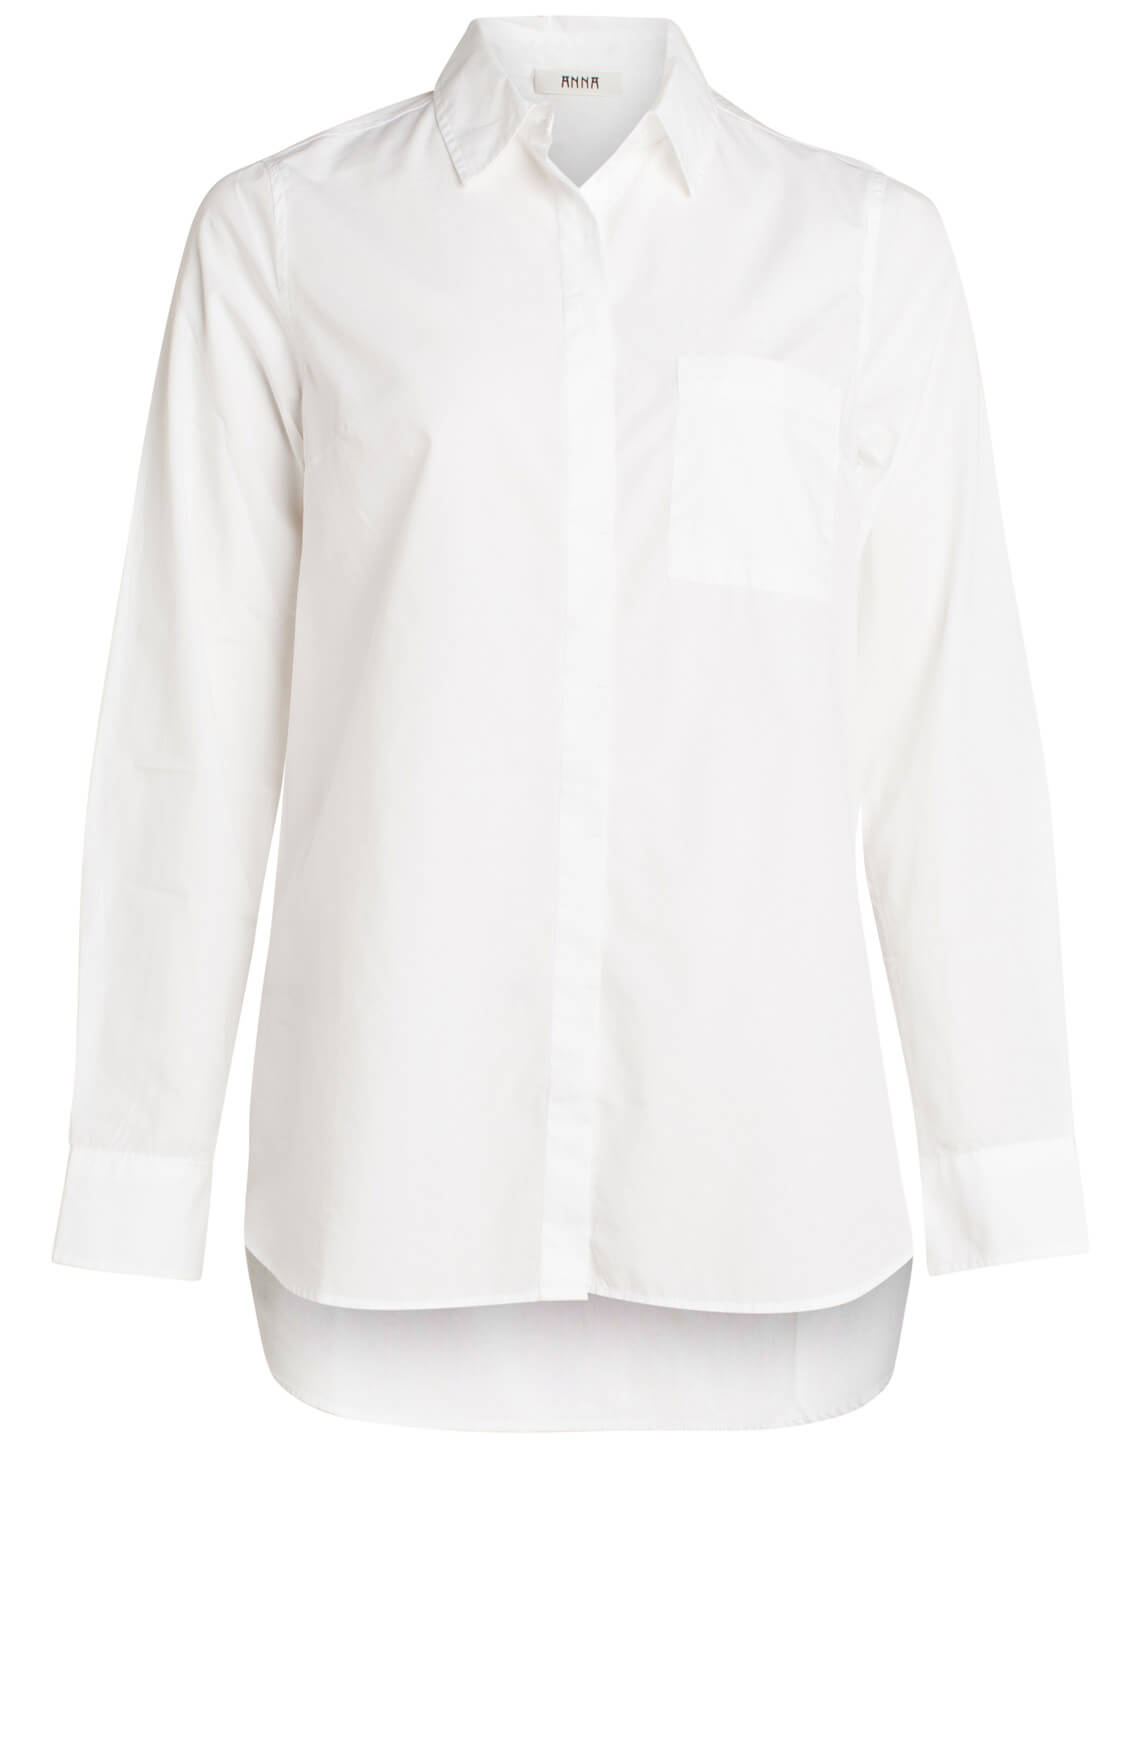 Anna Dames Casual blouse